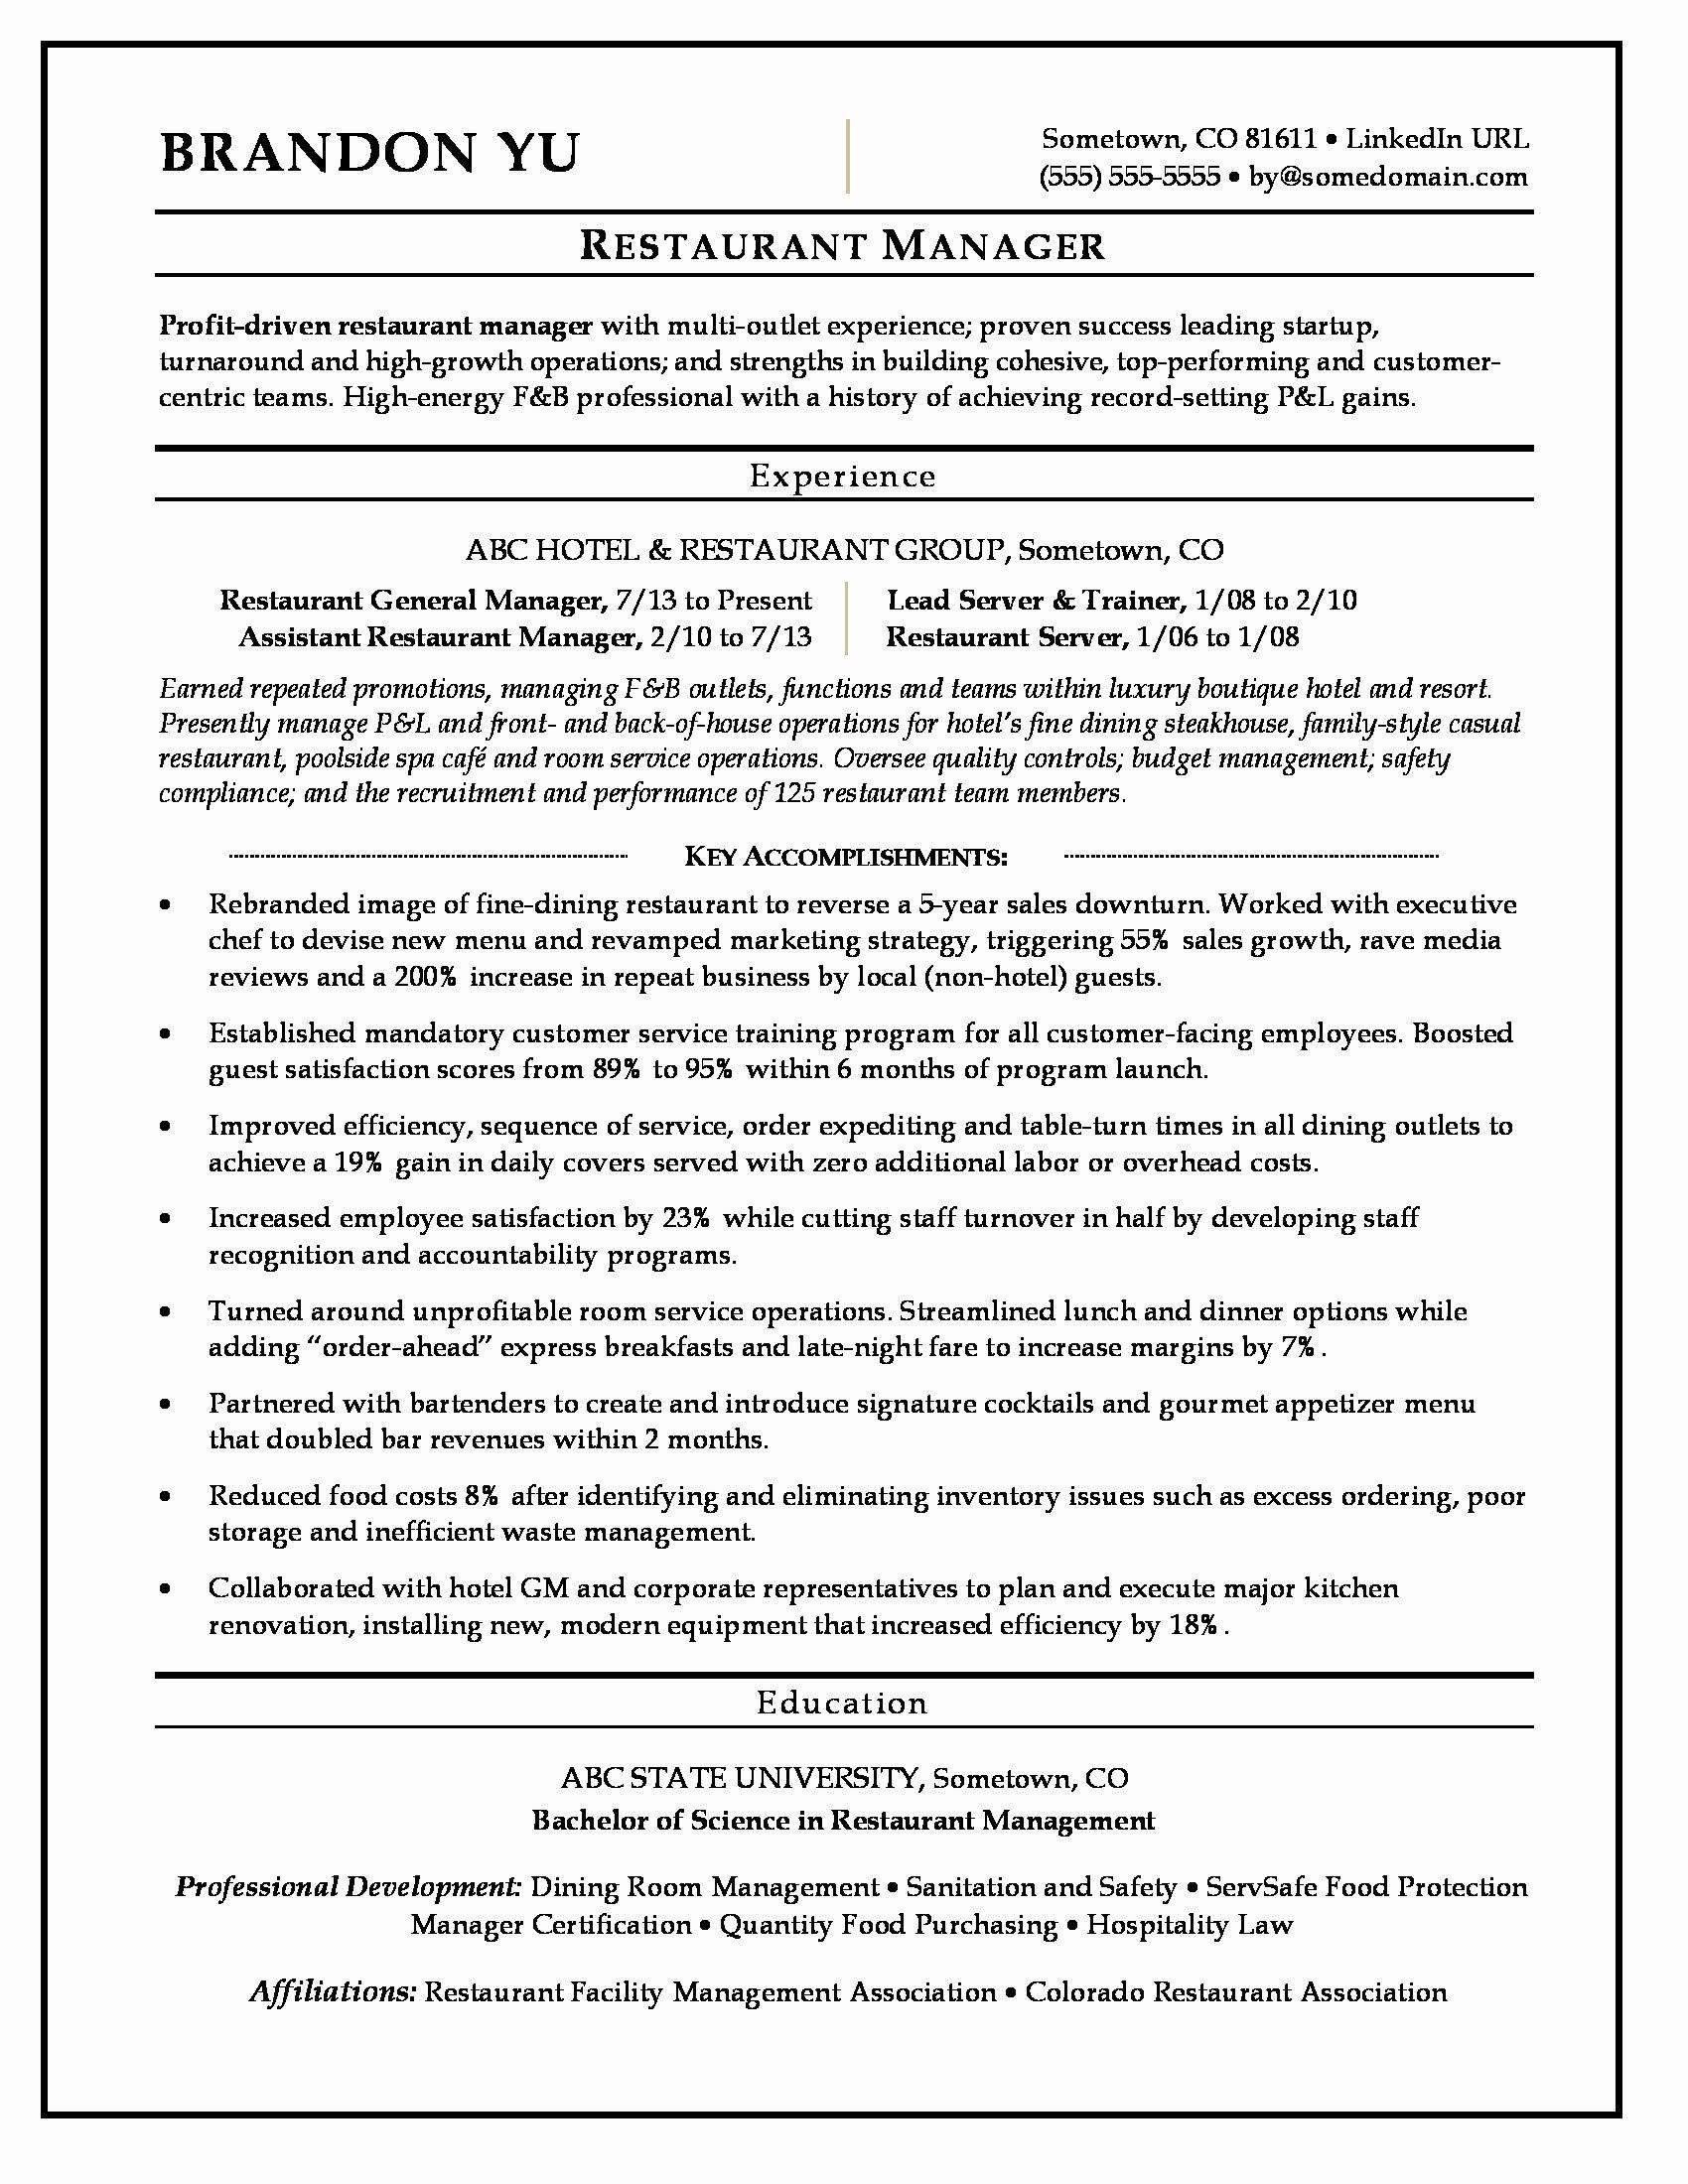 Sample Resume for Restaurant Unique Restaurant Manager Resume Sample